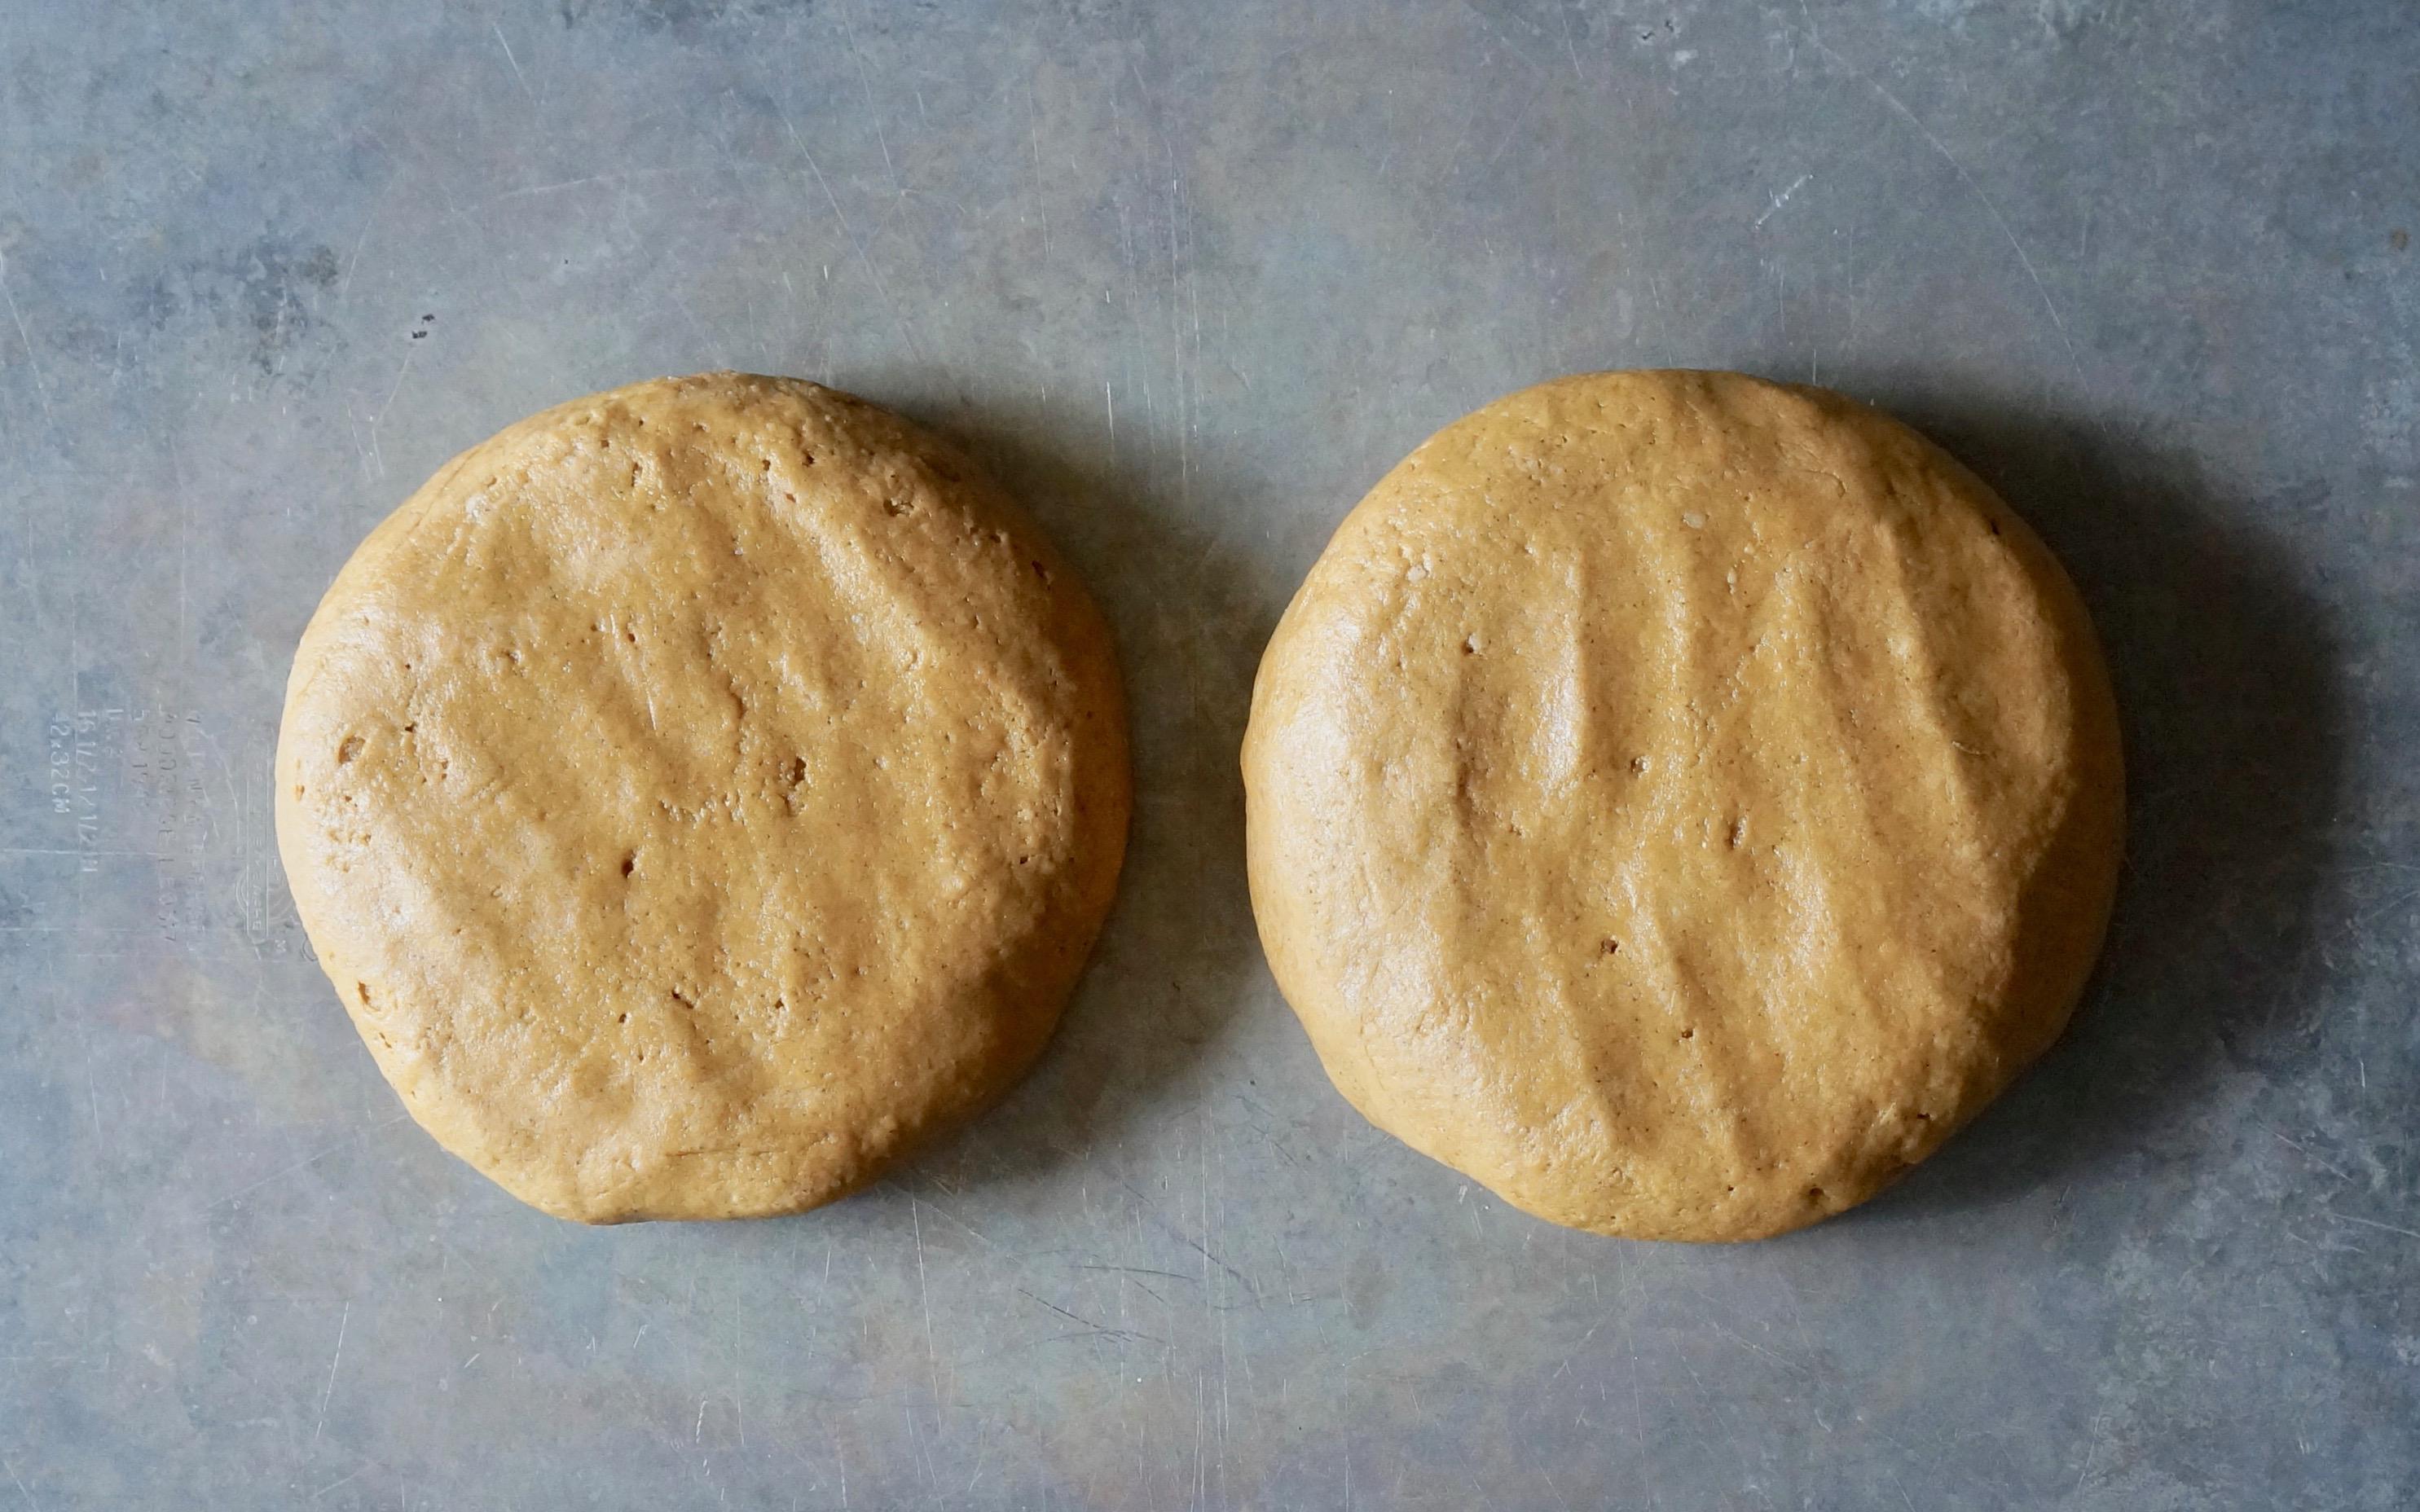 Buttermilk-Marranitos-Rebecca-Gordon-Editor-In-Chief-Buttermilk-LIpstick-Culinary-Entertaining-Techniques-RebeccaGordon-Pastry-Chef-Cooking-Class-Birmingham-Alabama